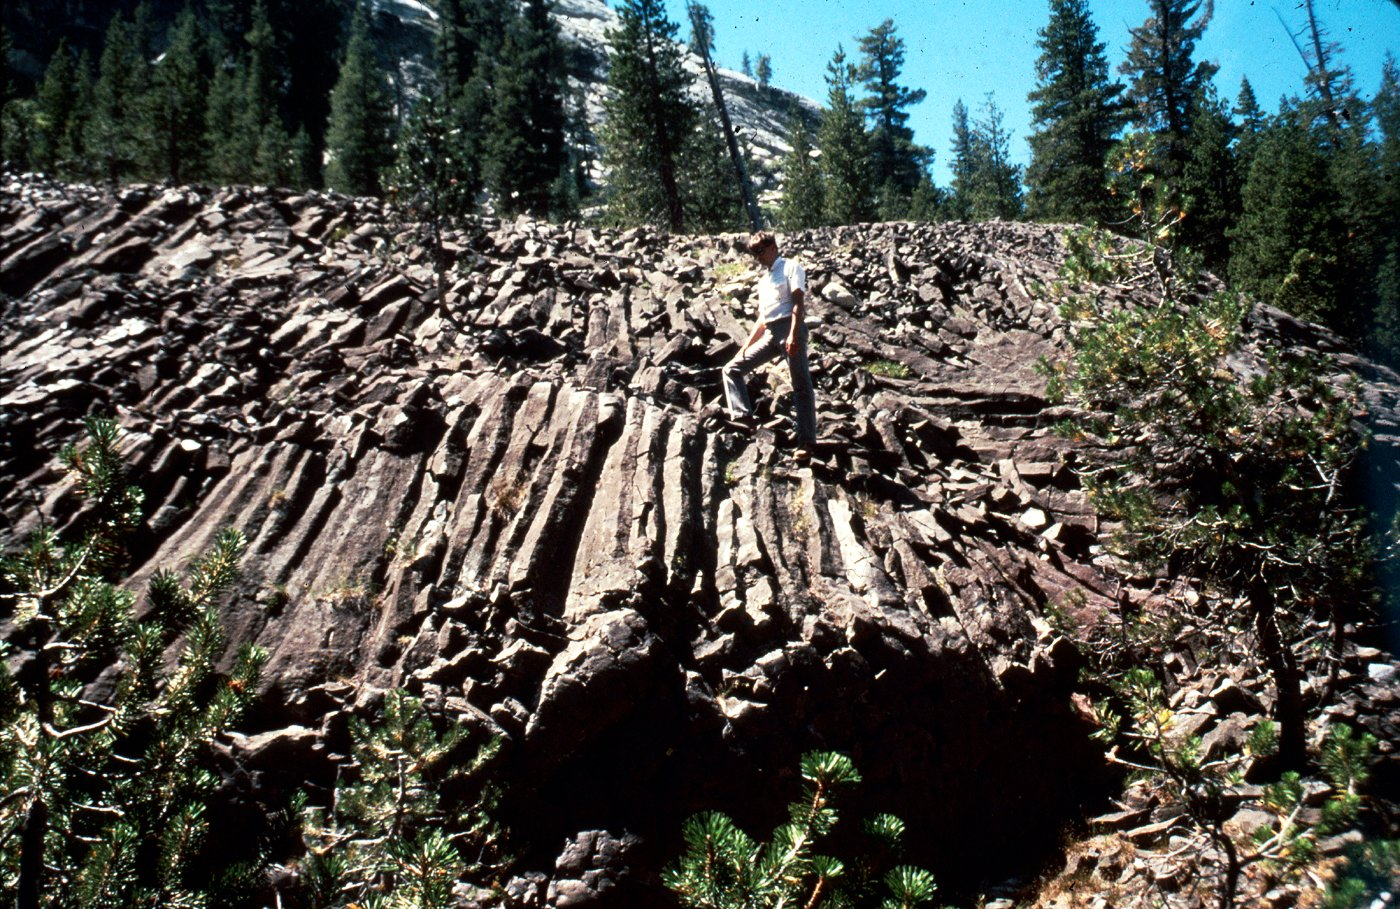 Lava Wallpaper Hd The Geologic Story Of Yosemite National Park 1987